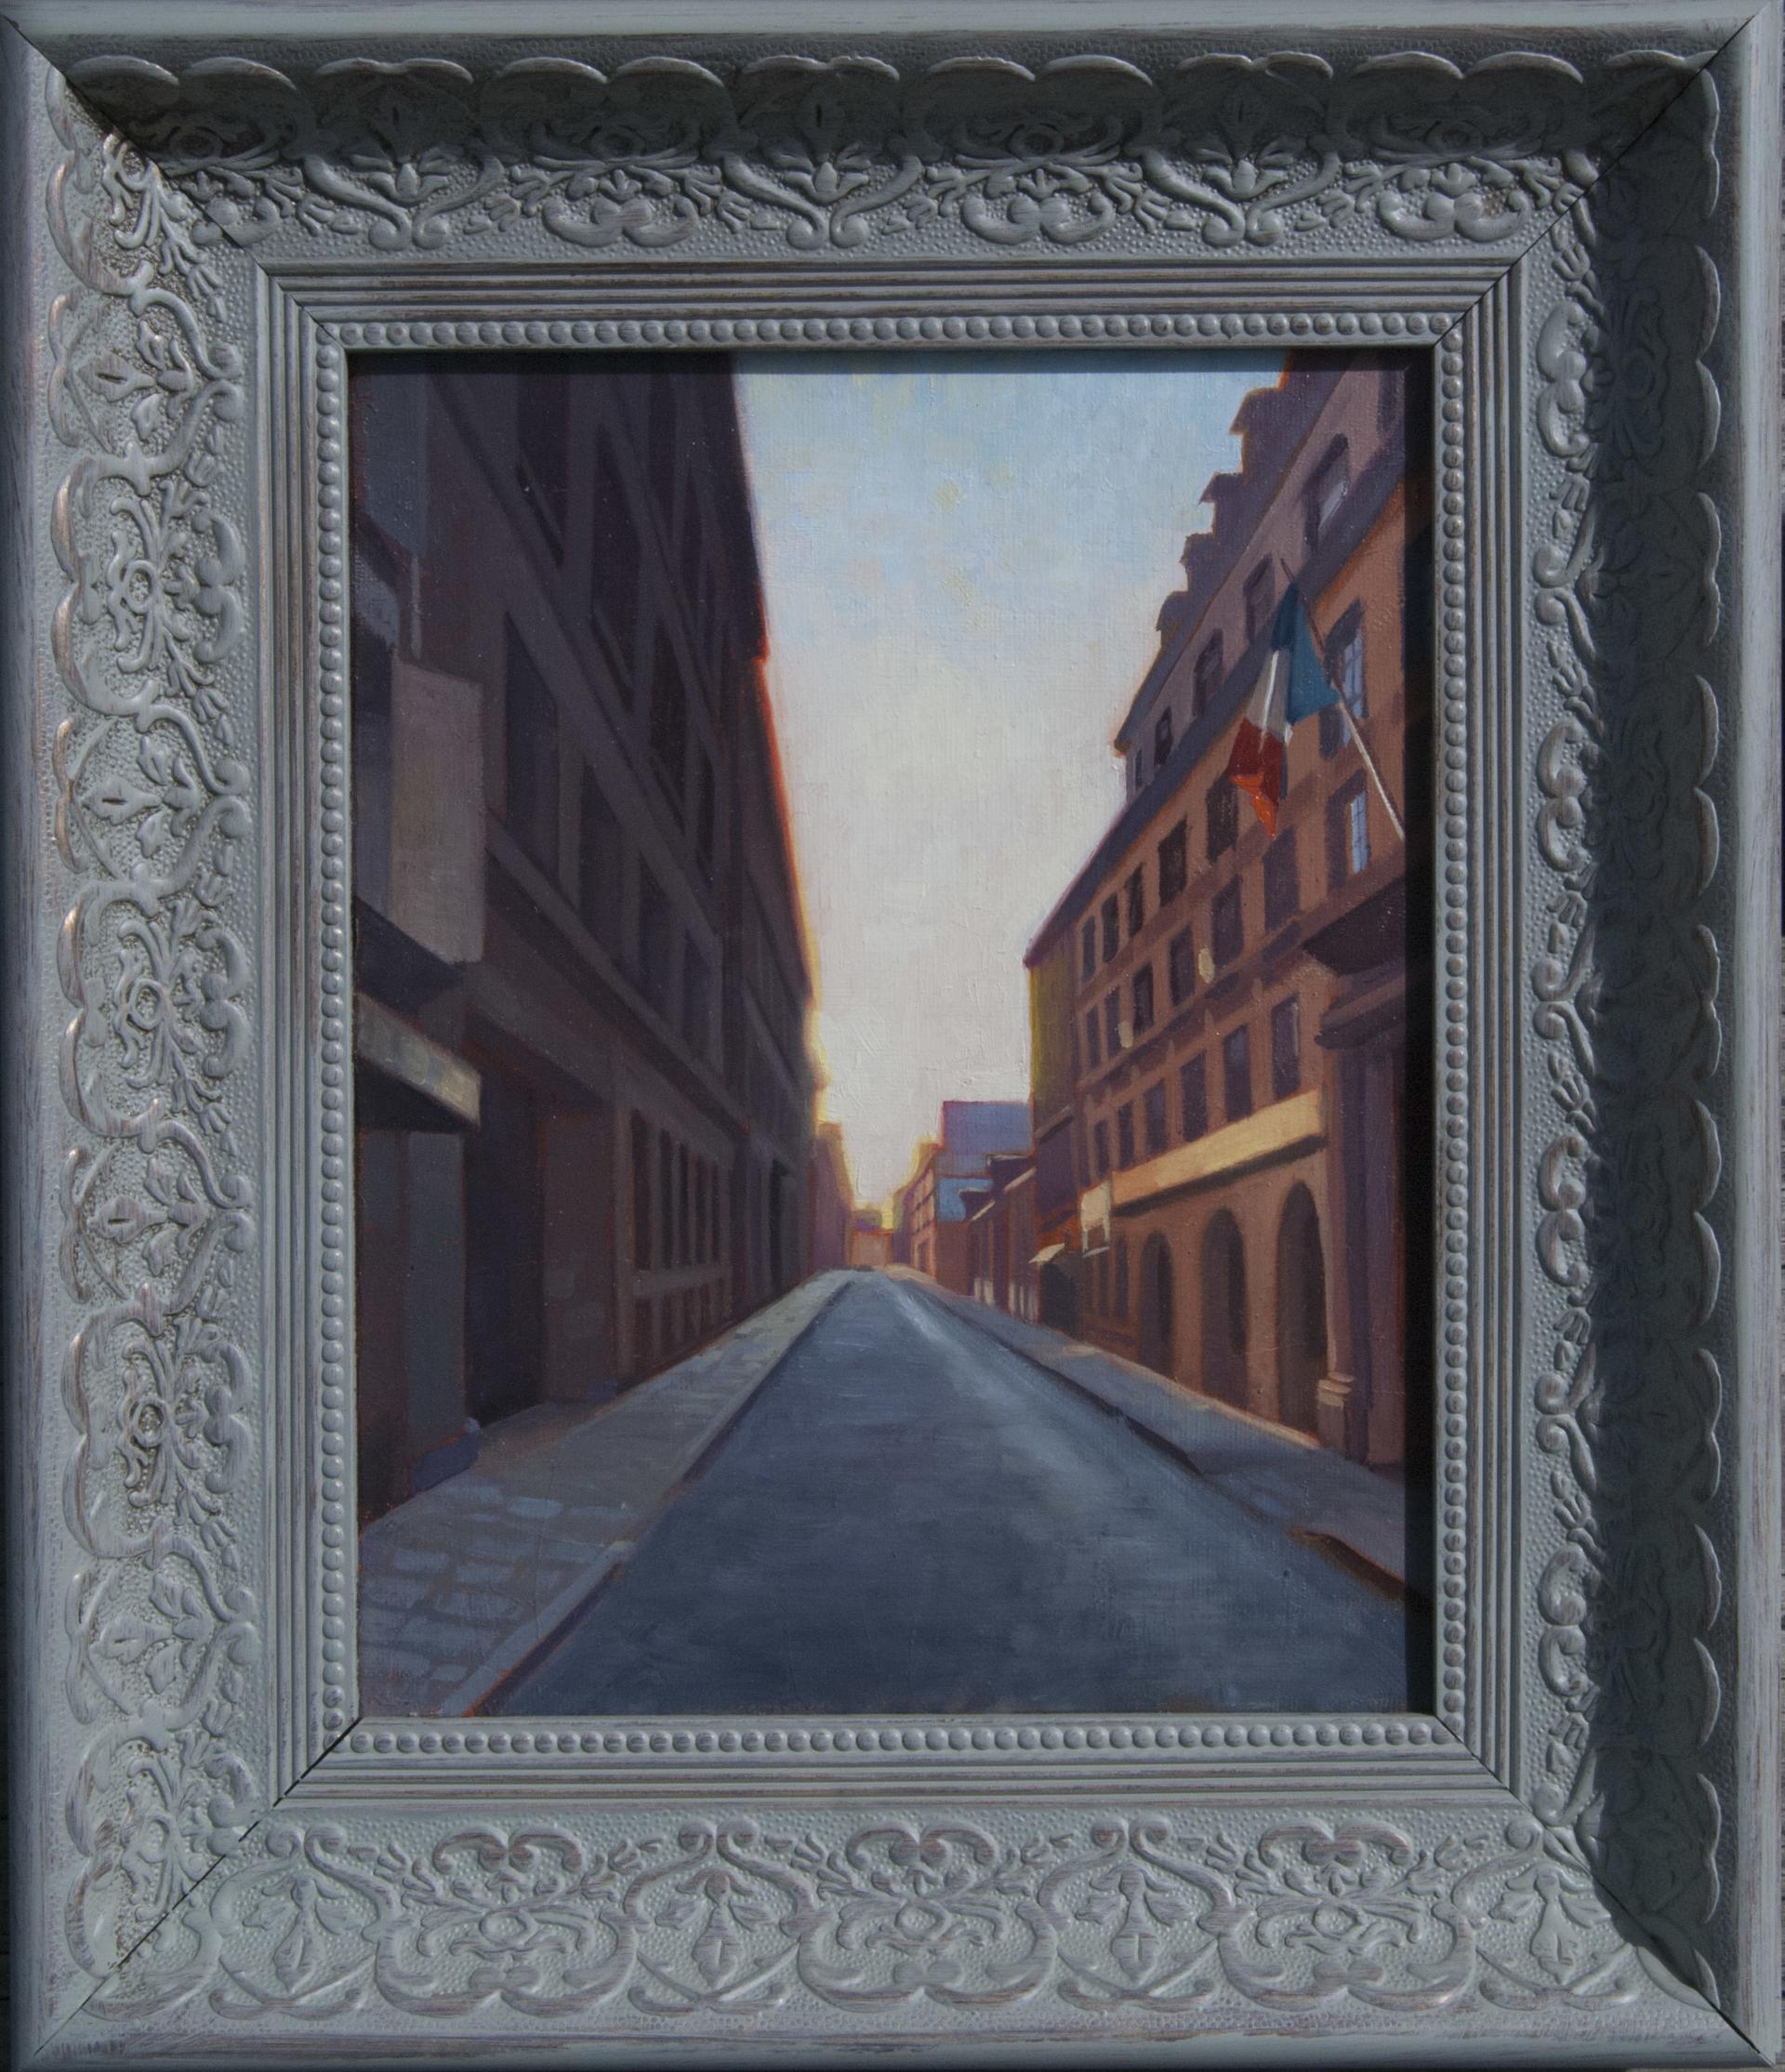 Paris Street 1 by Richard T Scott